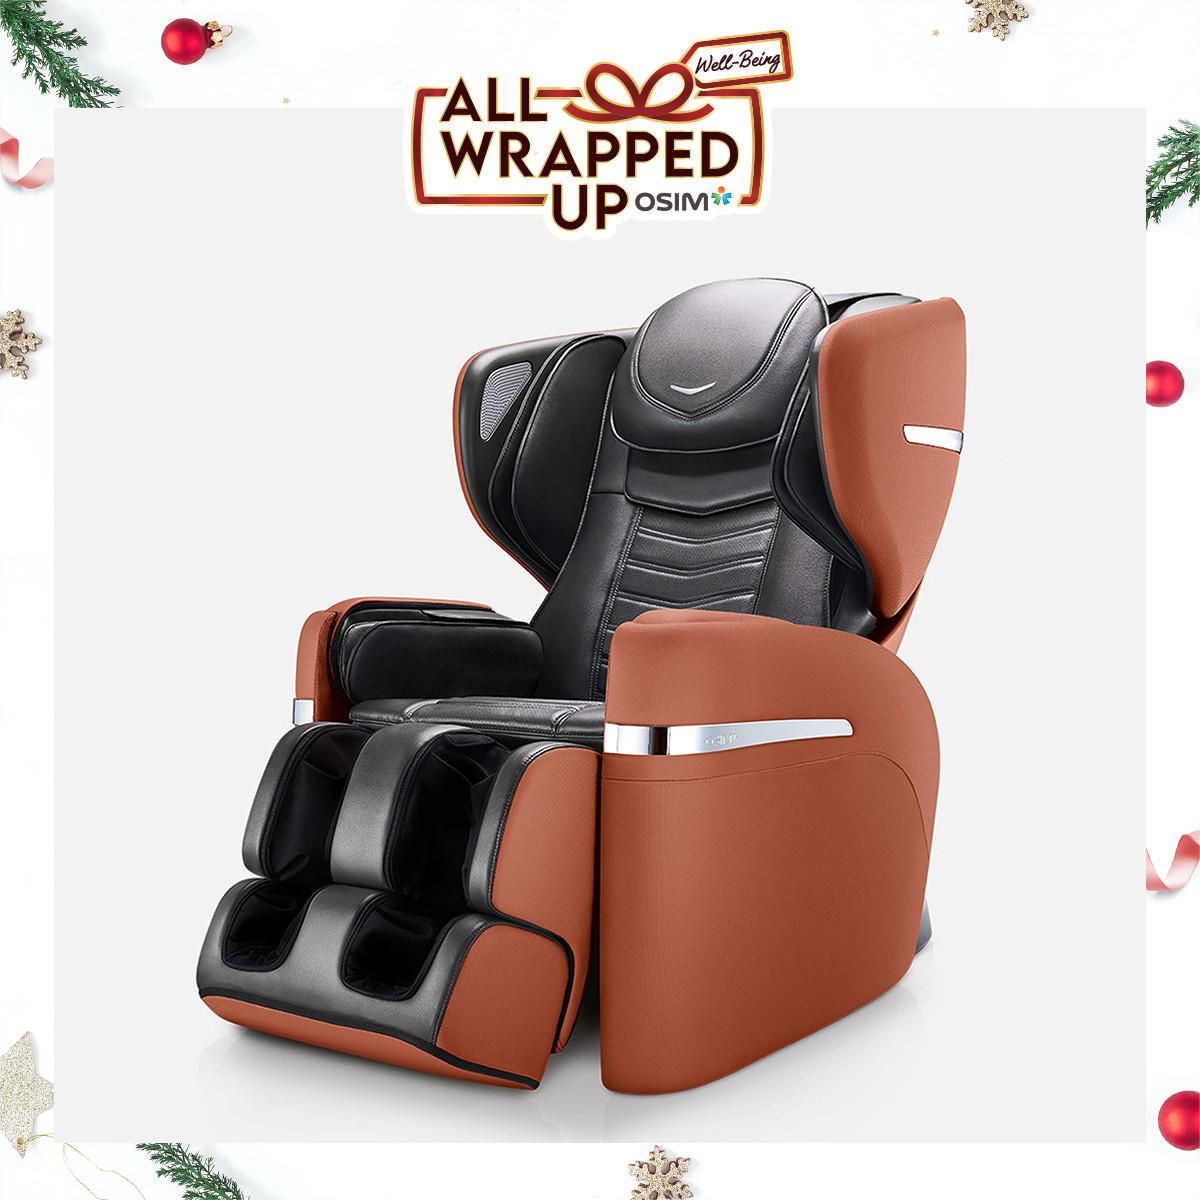 uDivine V Massage Chair